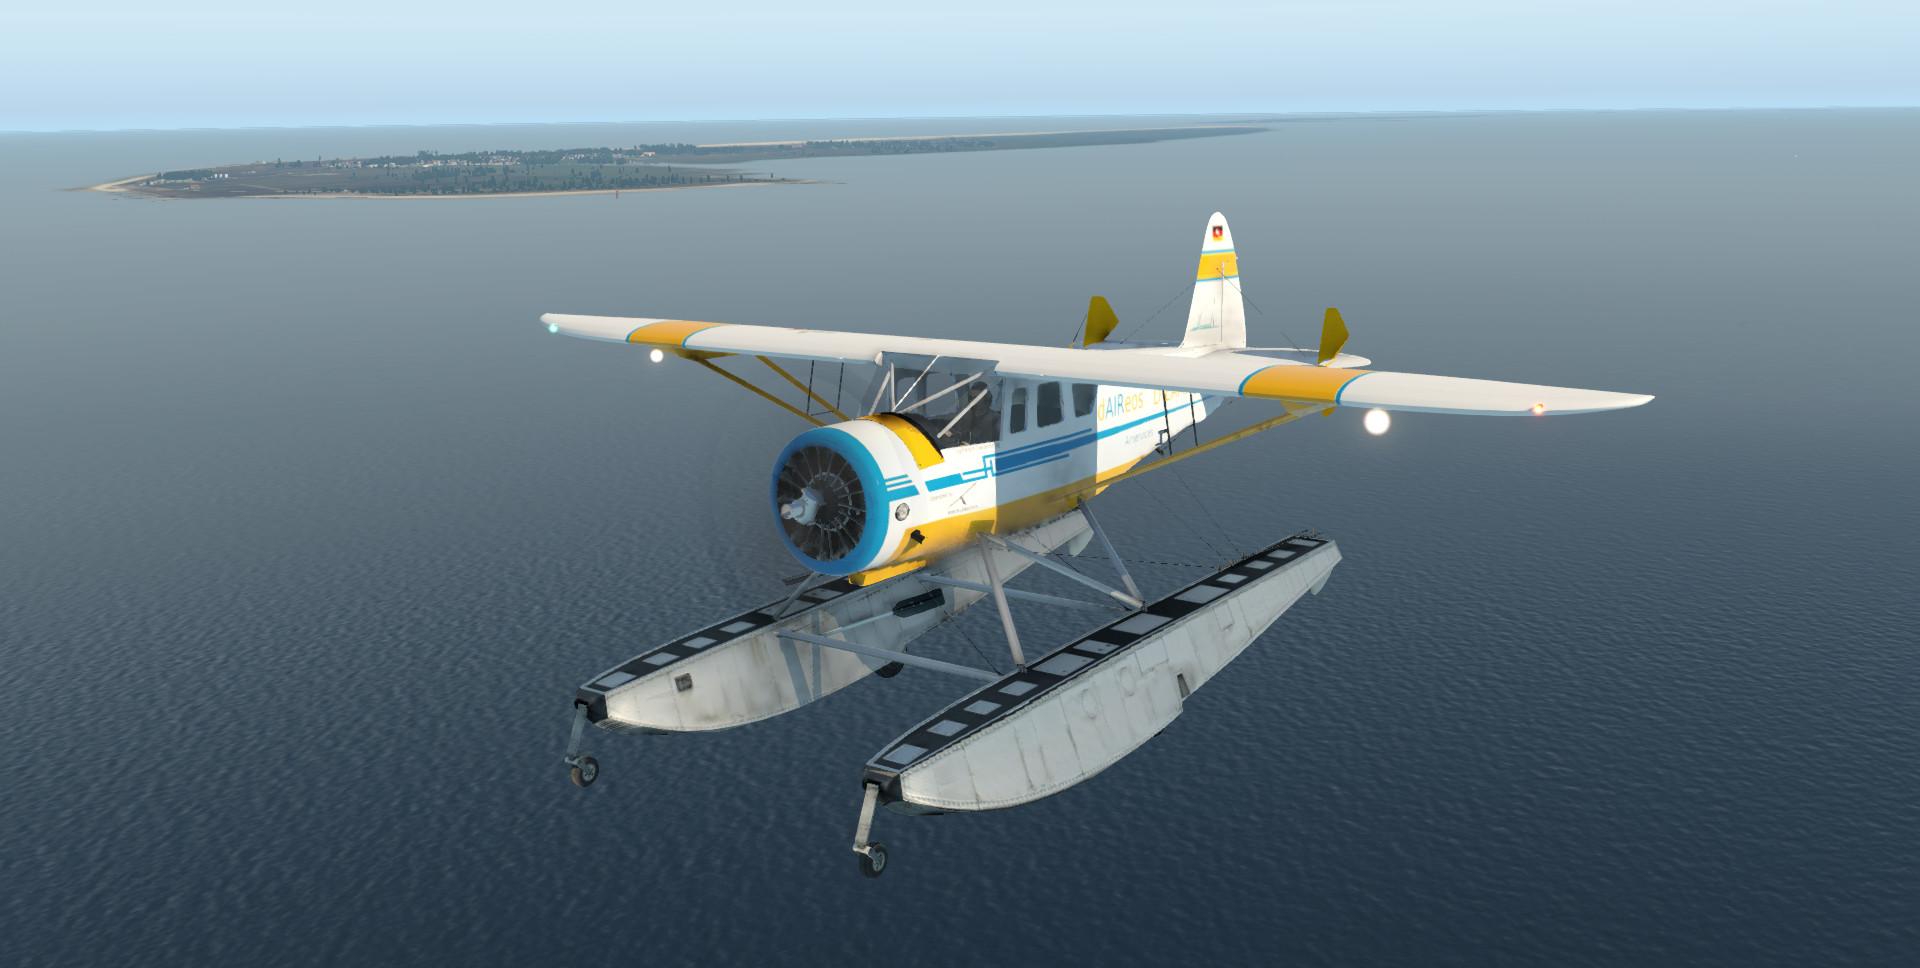 nordseerundflug-0078fjsi.jpg